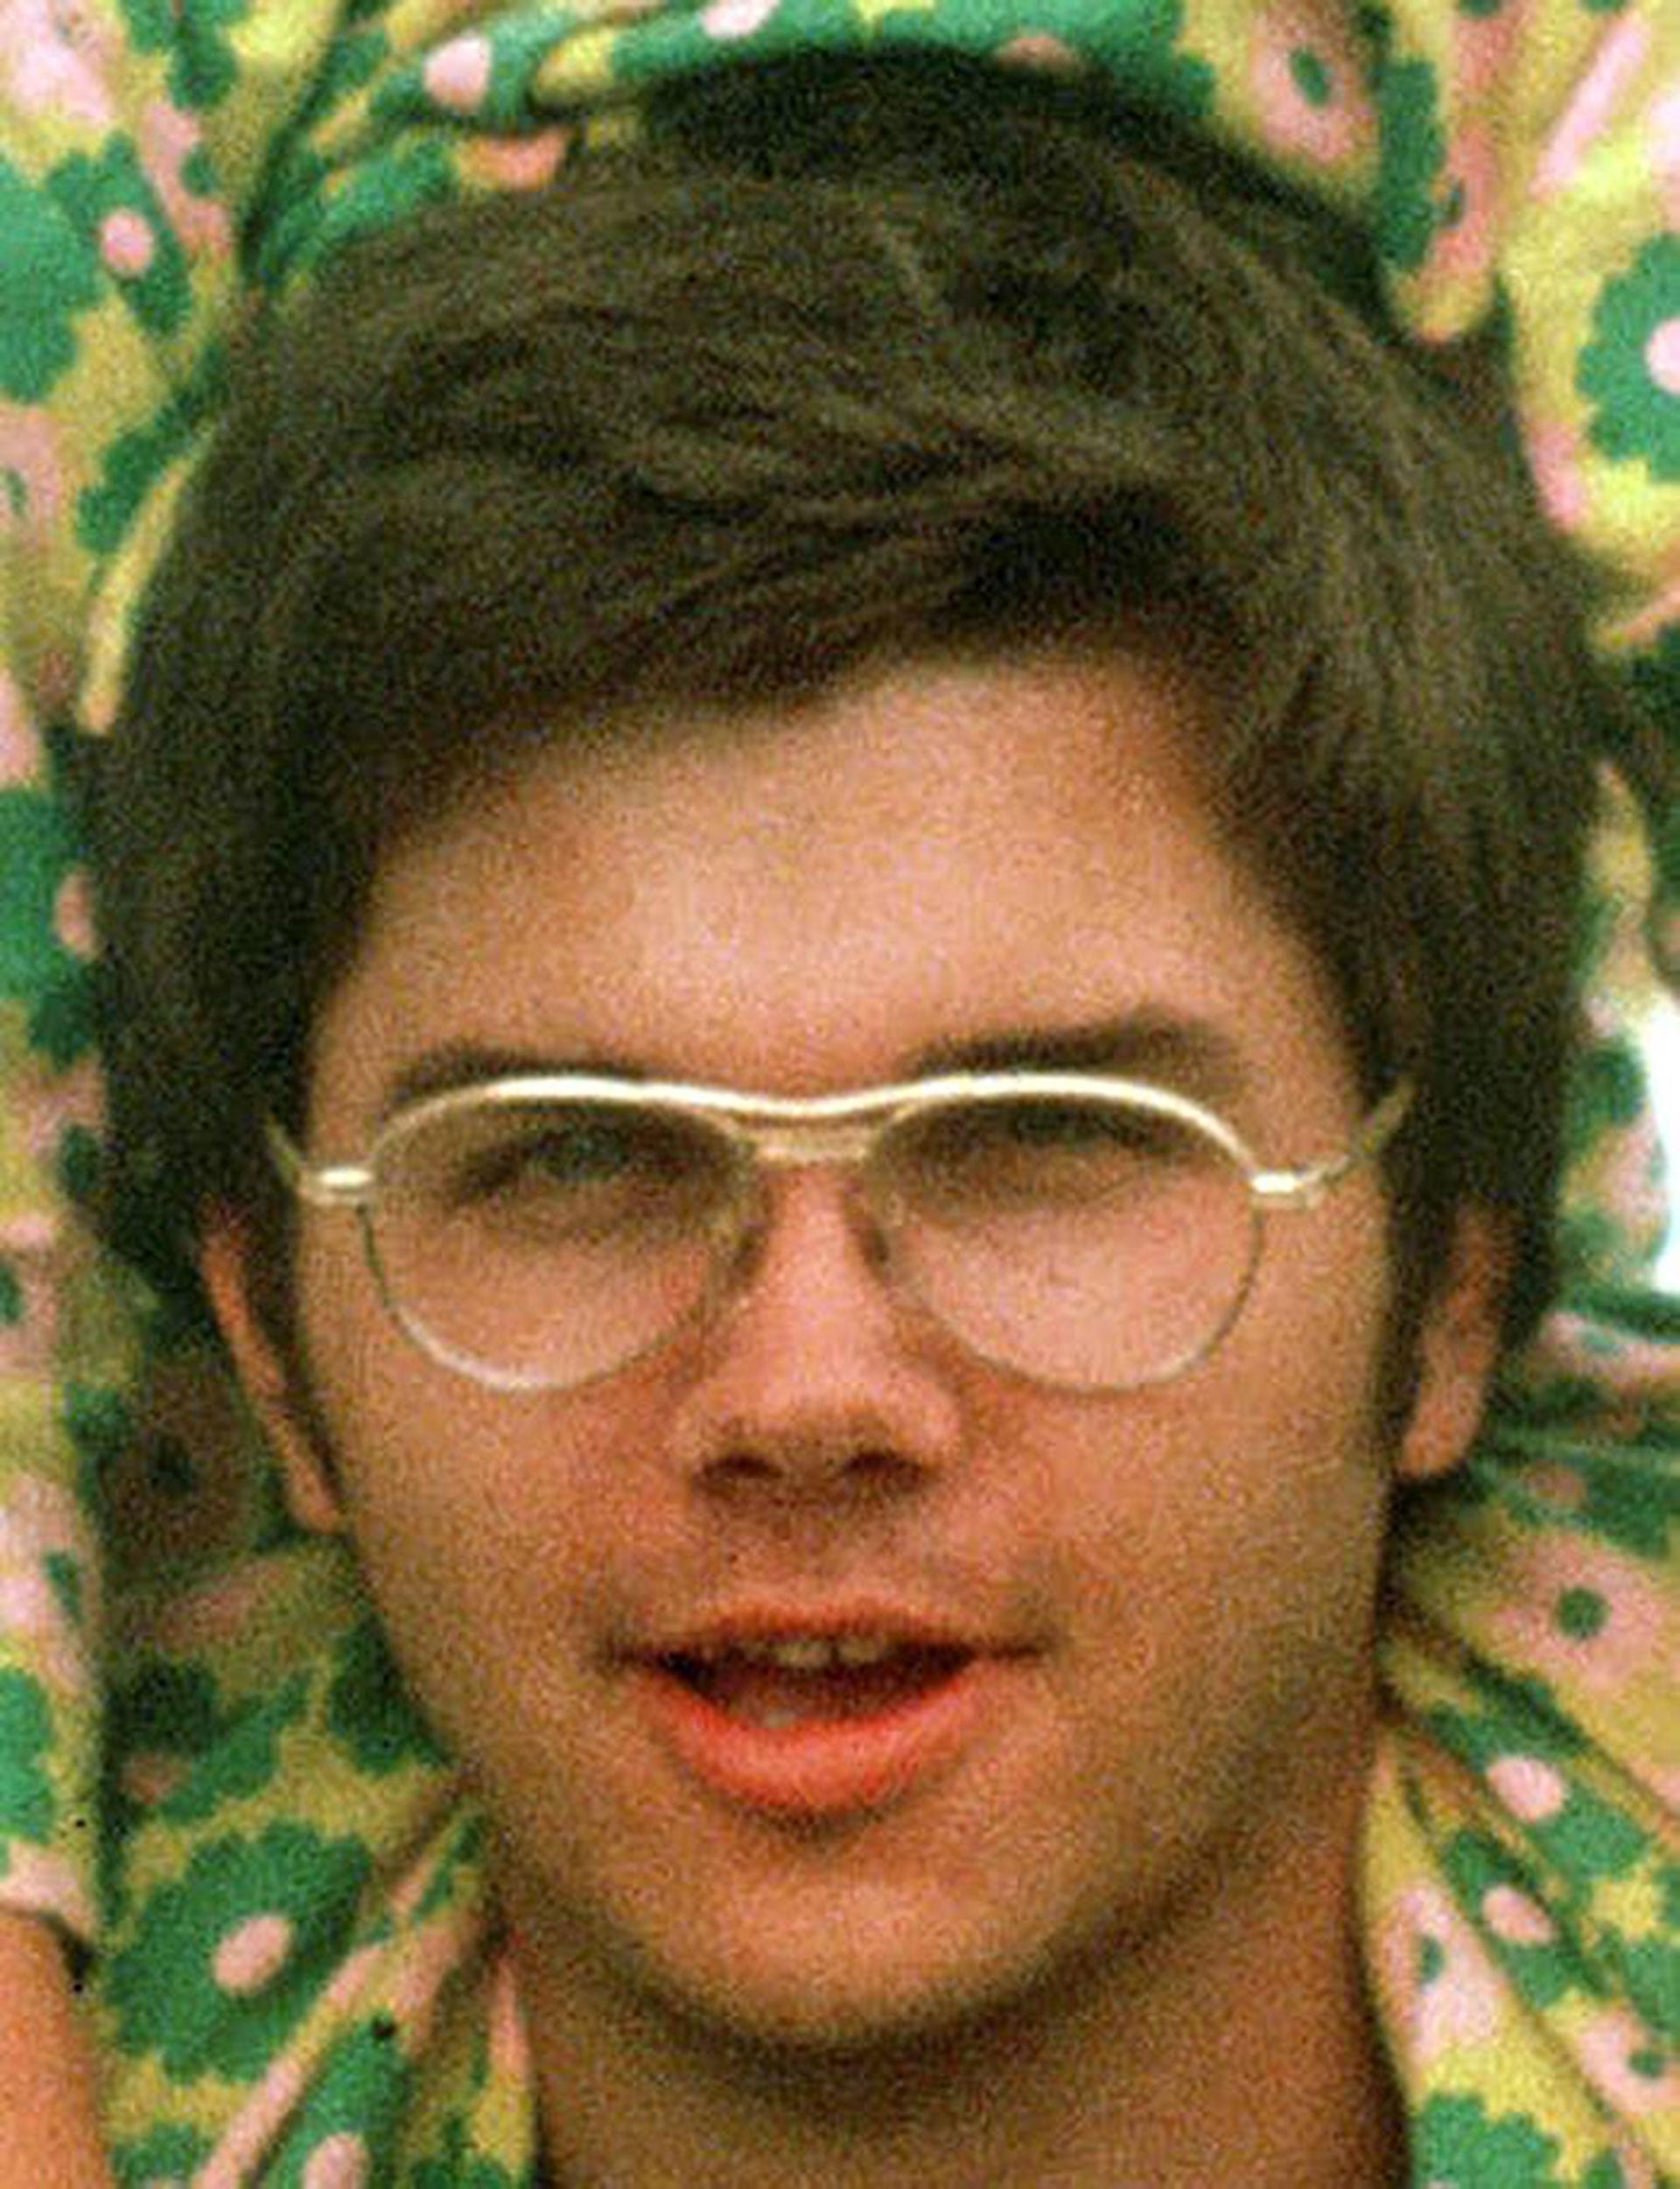 Mark Chapman en la época en que asesinó a John Lennon (AP)